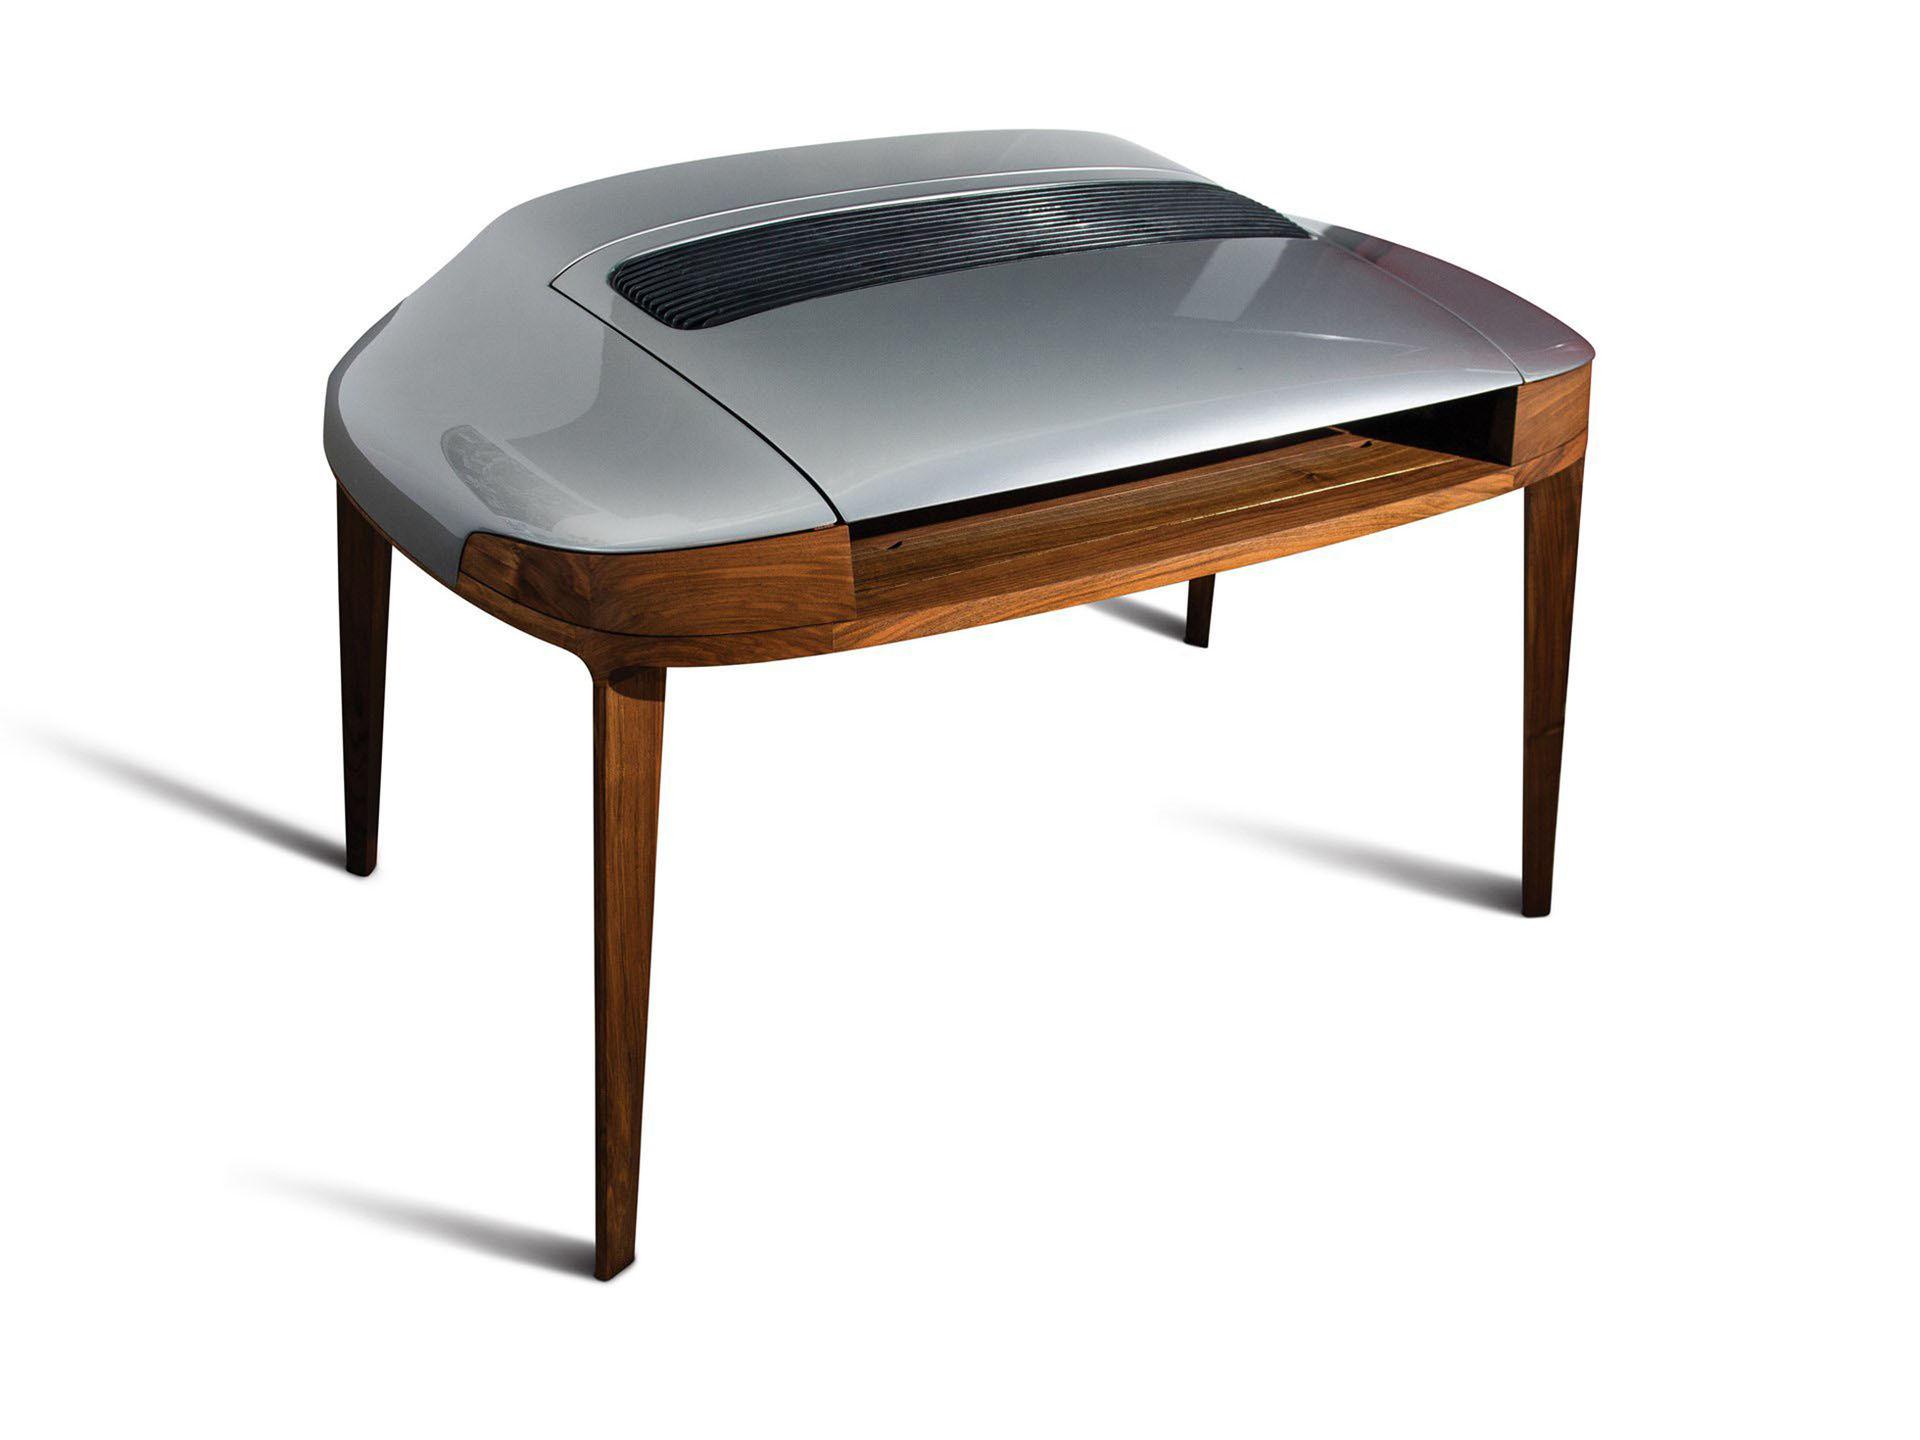 En Porsche-rumpa som skrivbord